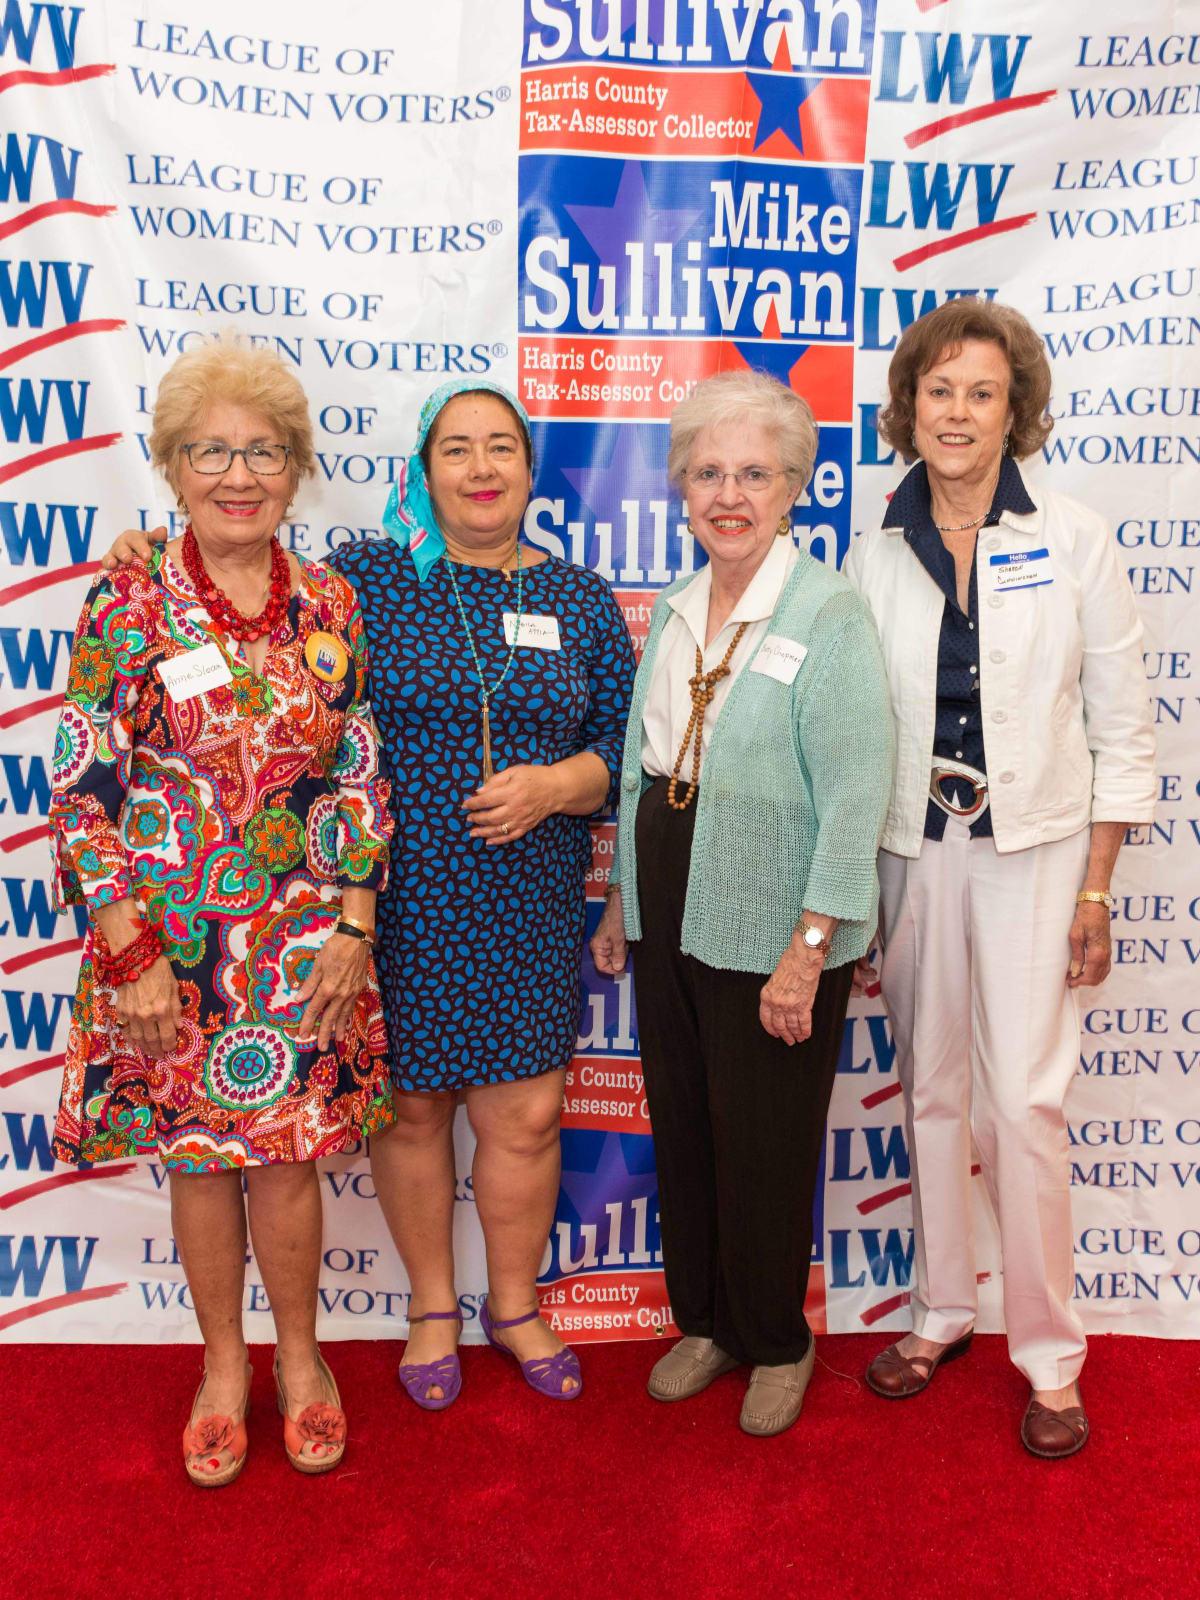 Anne Sloan, Nabila Attia, Betty Chapman, Sharon Cunningham at Houston's Women's Equality Day Celebration